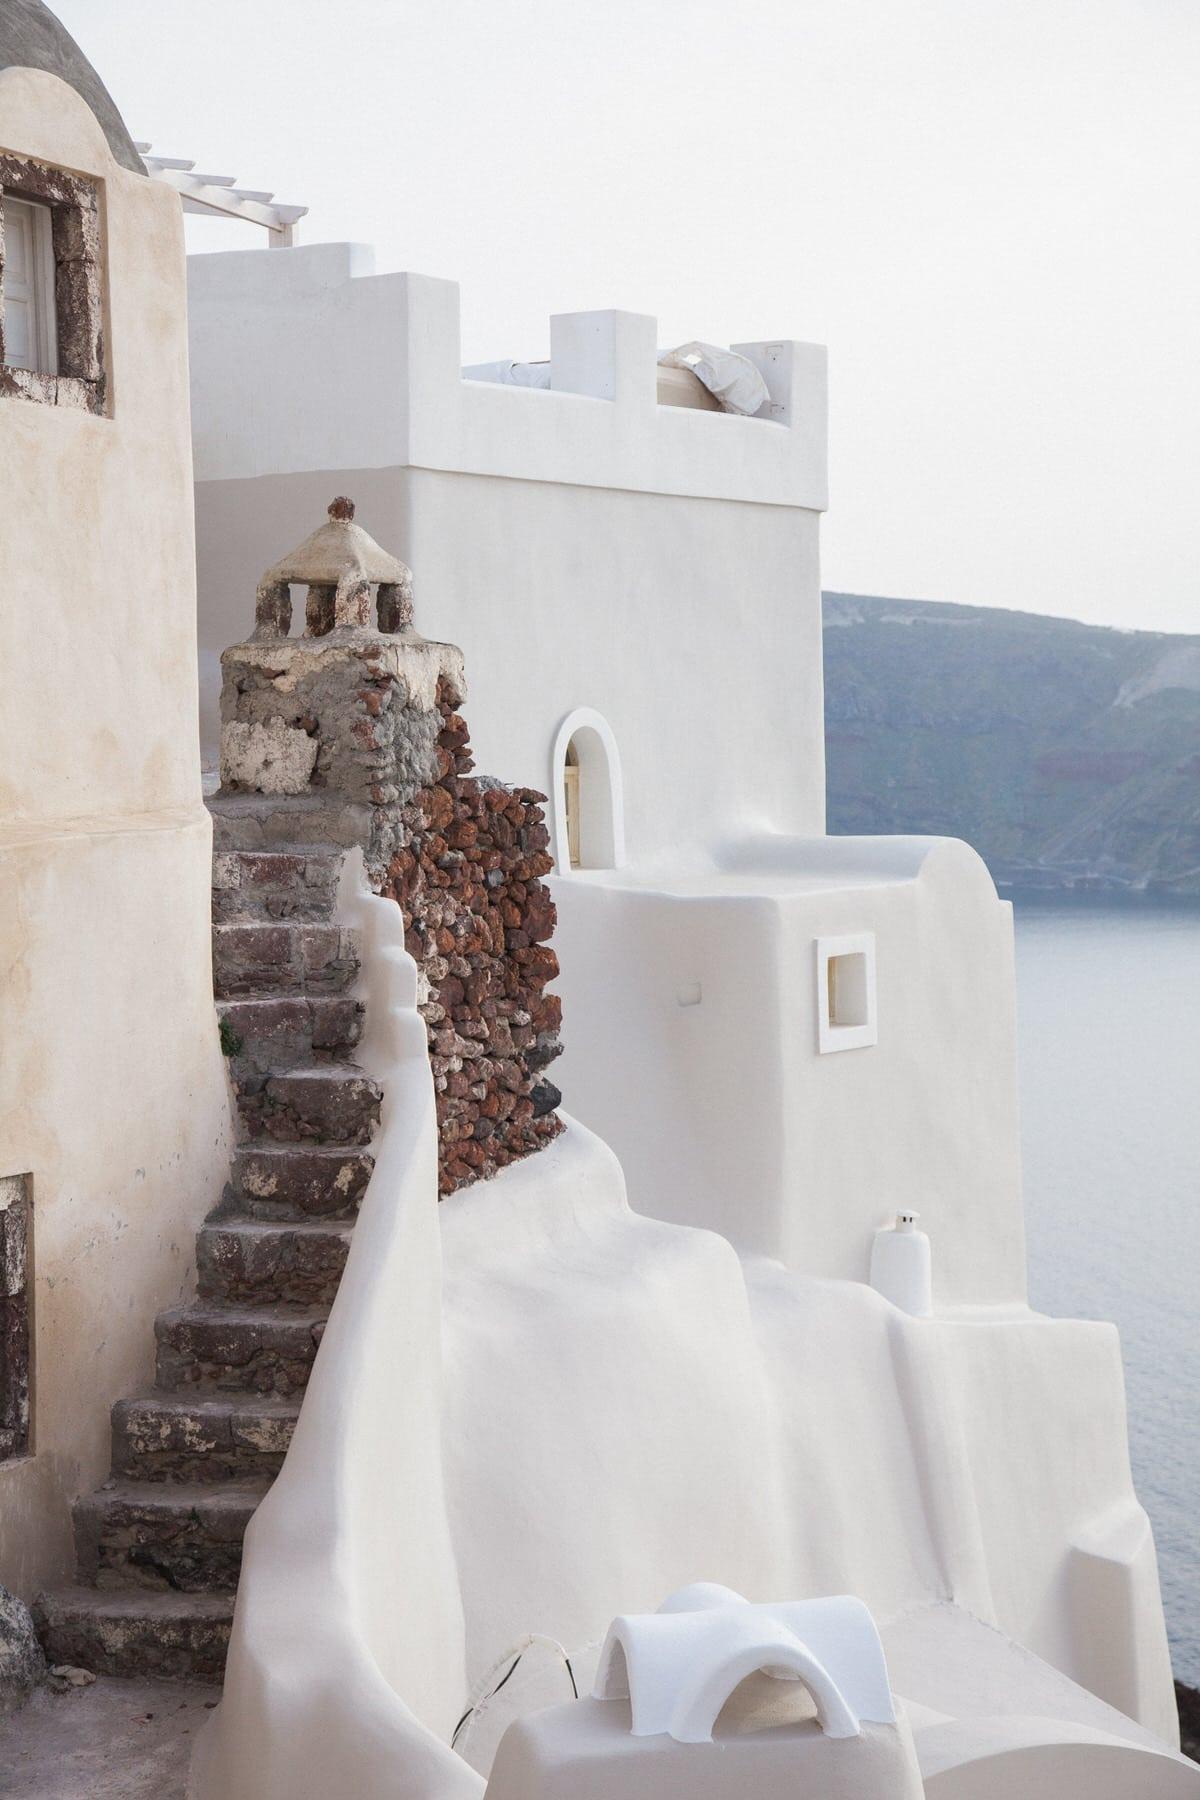 Santorini-Greece-black-and-white-fine-art-photography-by-Studio-L-photographer-Laura-Schneider-_2949